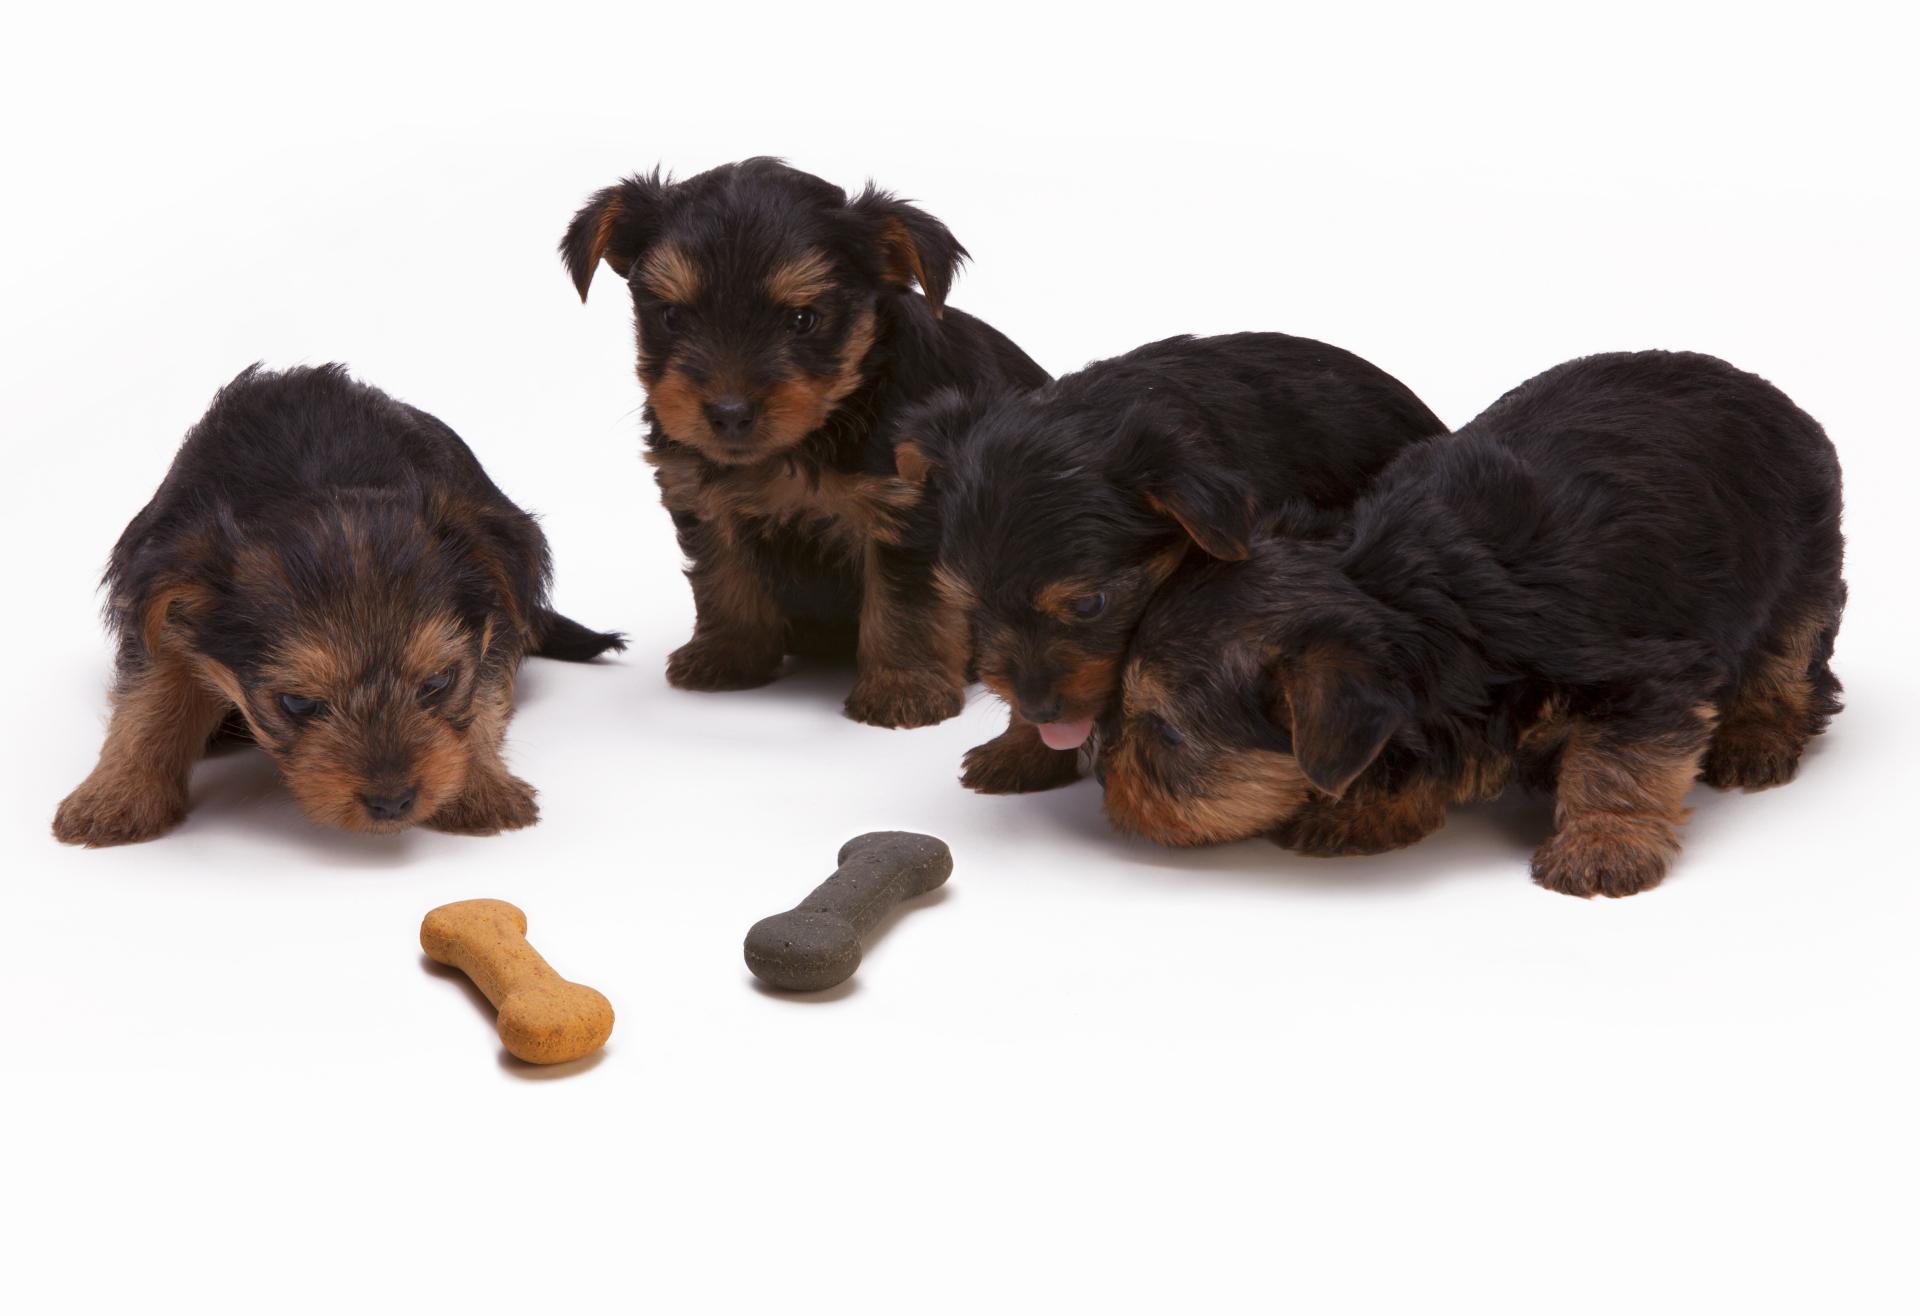 puppies eyeballing a dog treat